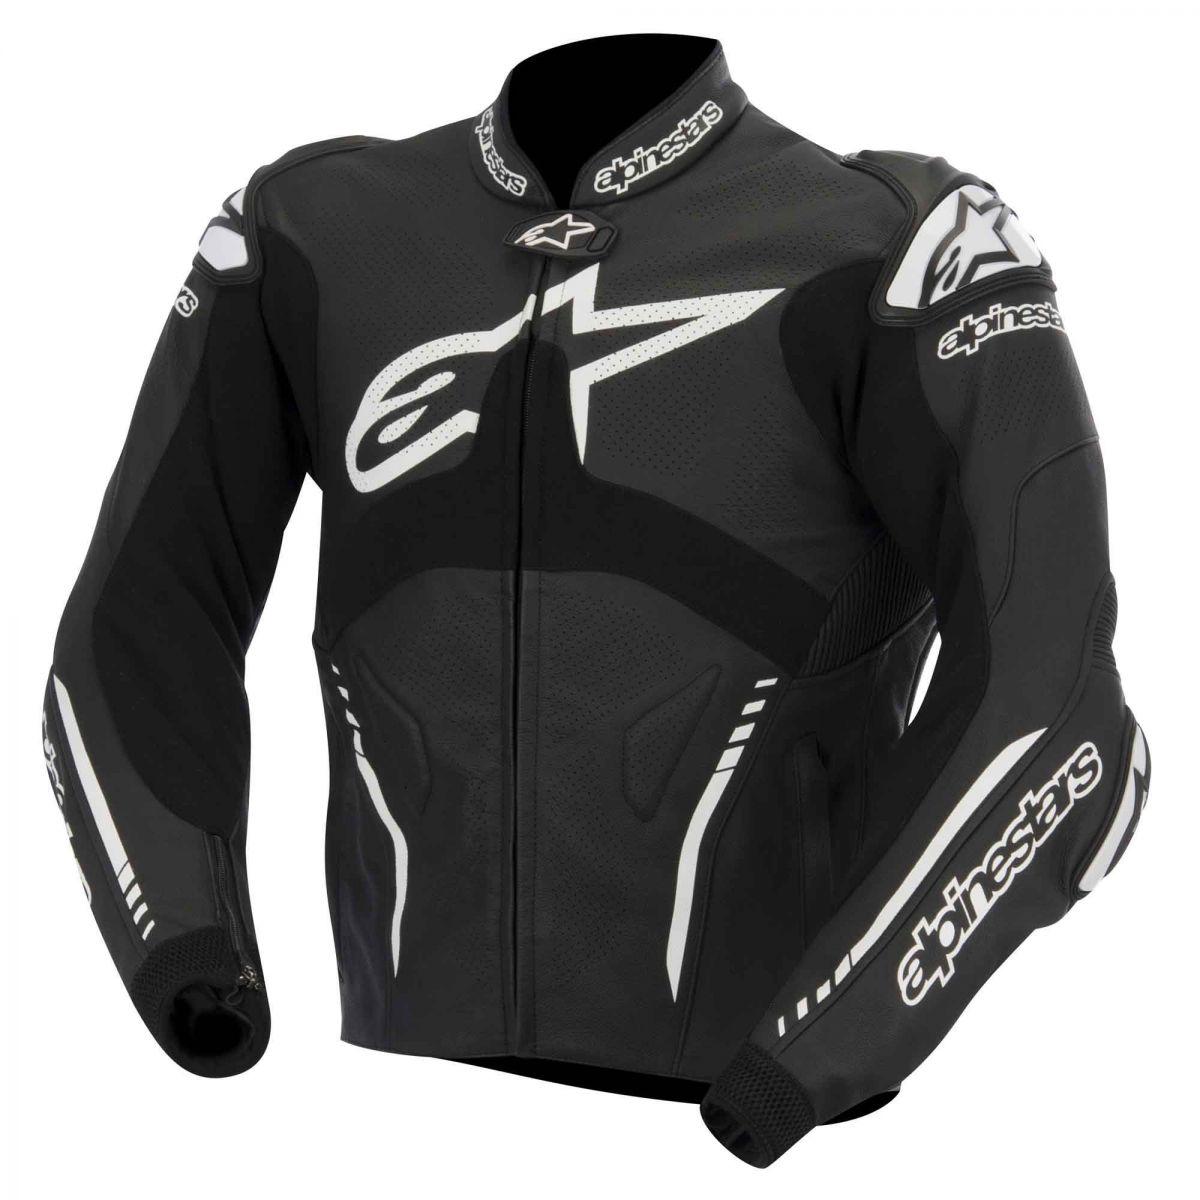 Jaqueta Alpinestars Atem Couro ( Black) Outlet Semana do Consumidor!  - Super Bike - Loja Oficial Alpinestars